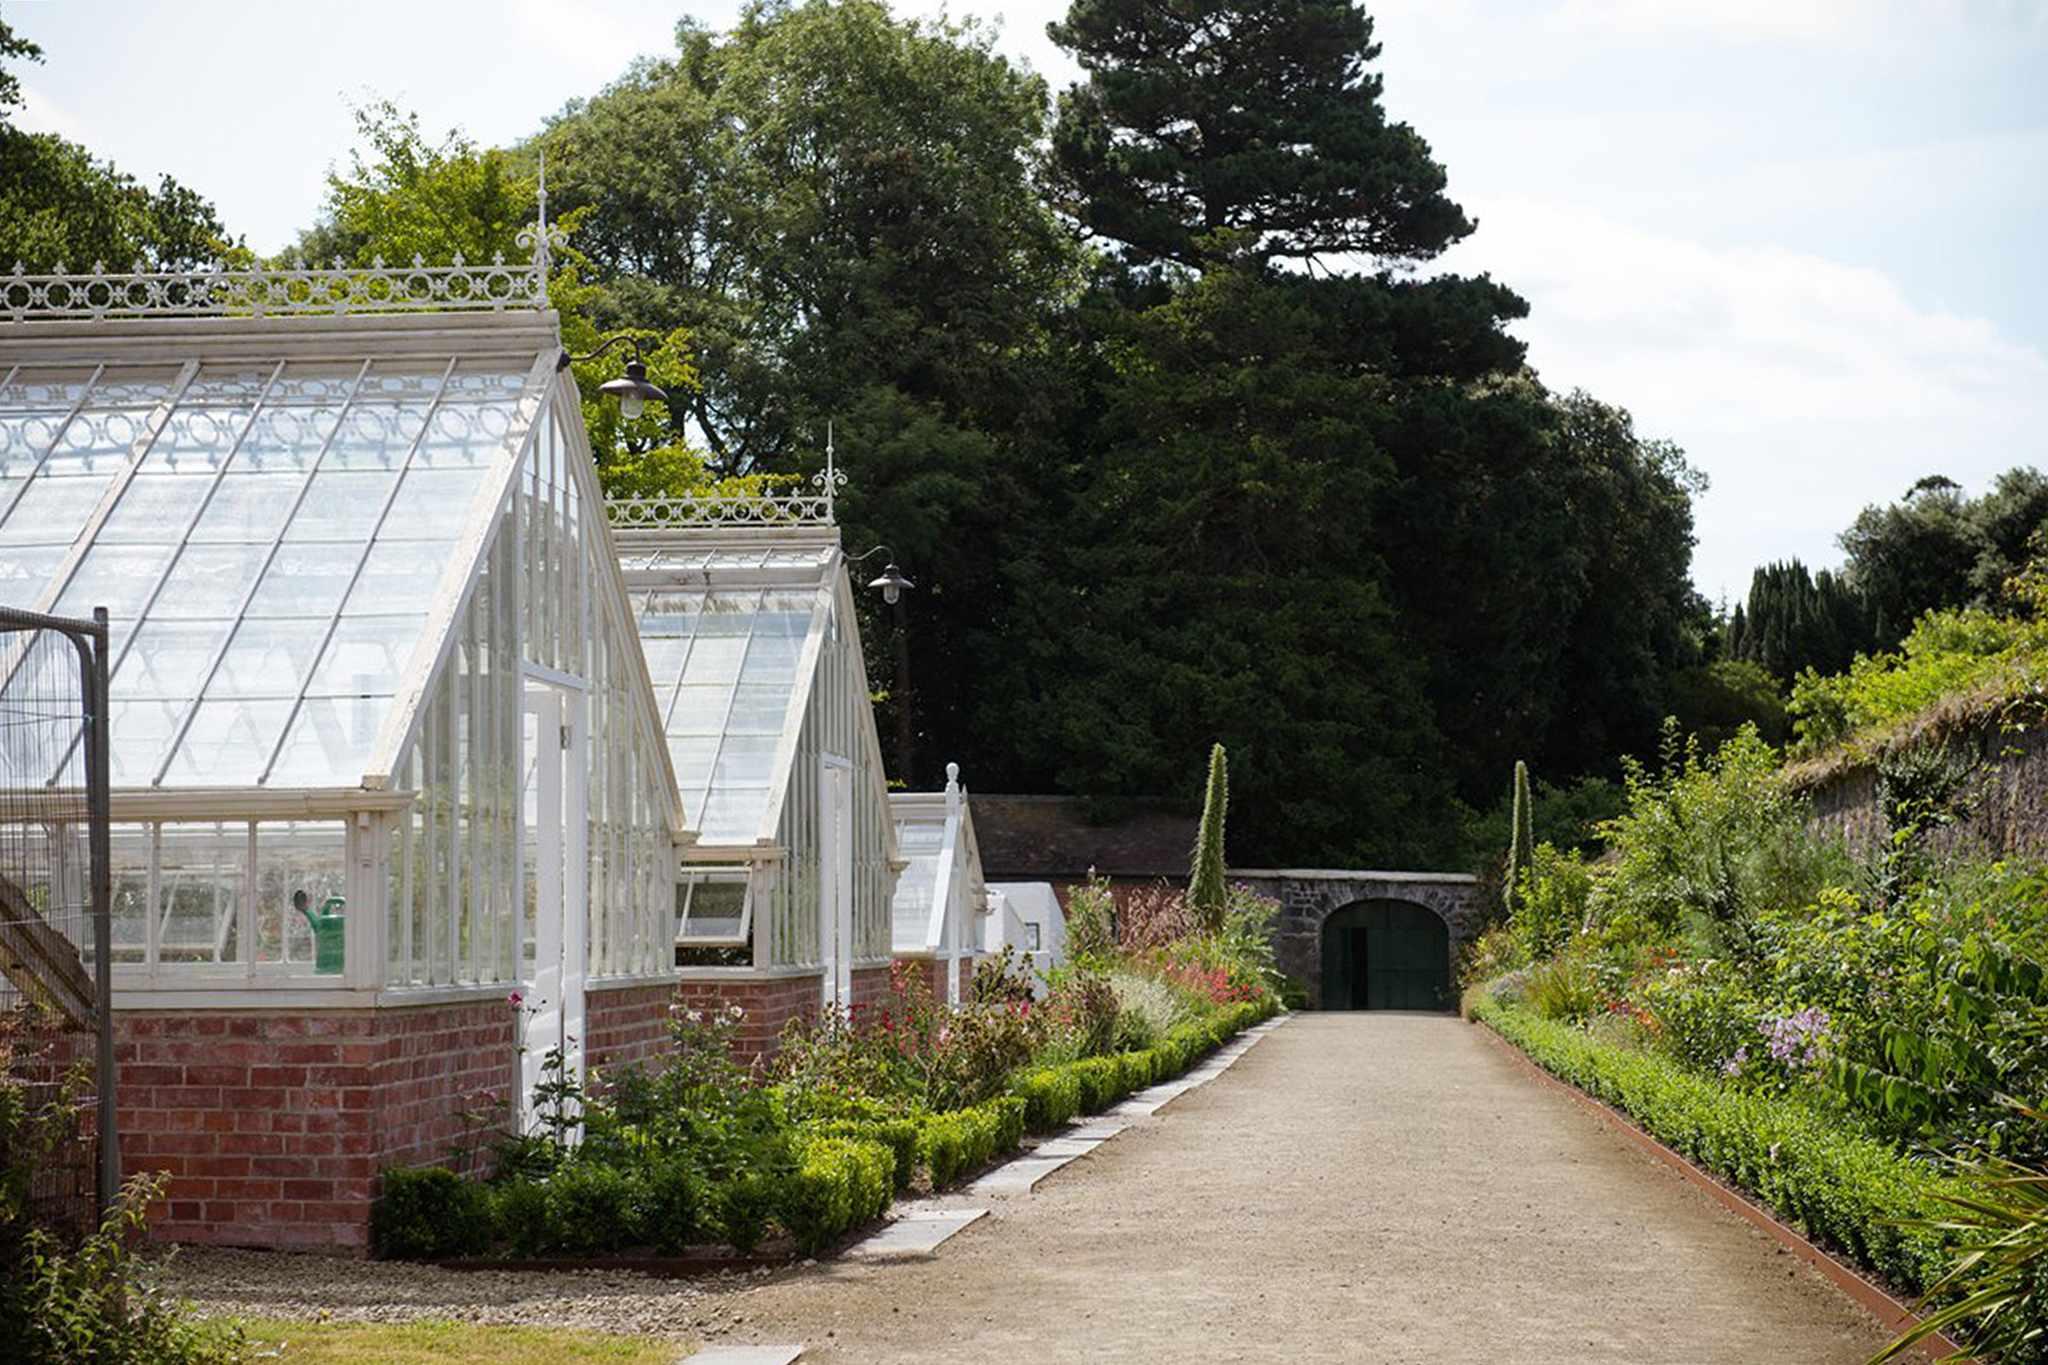 Fota House, Arboretum & Gardens